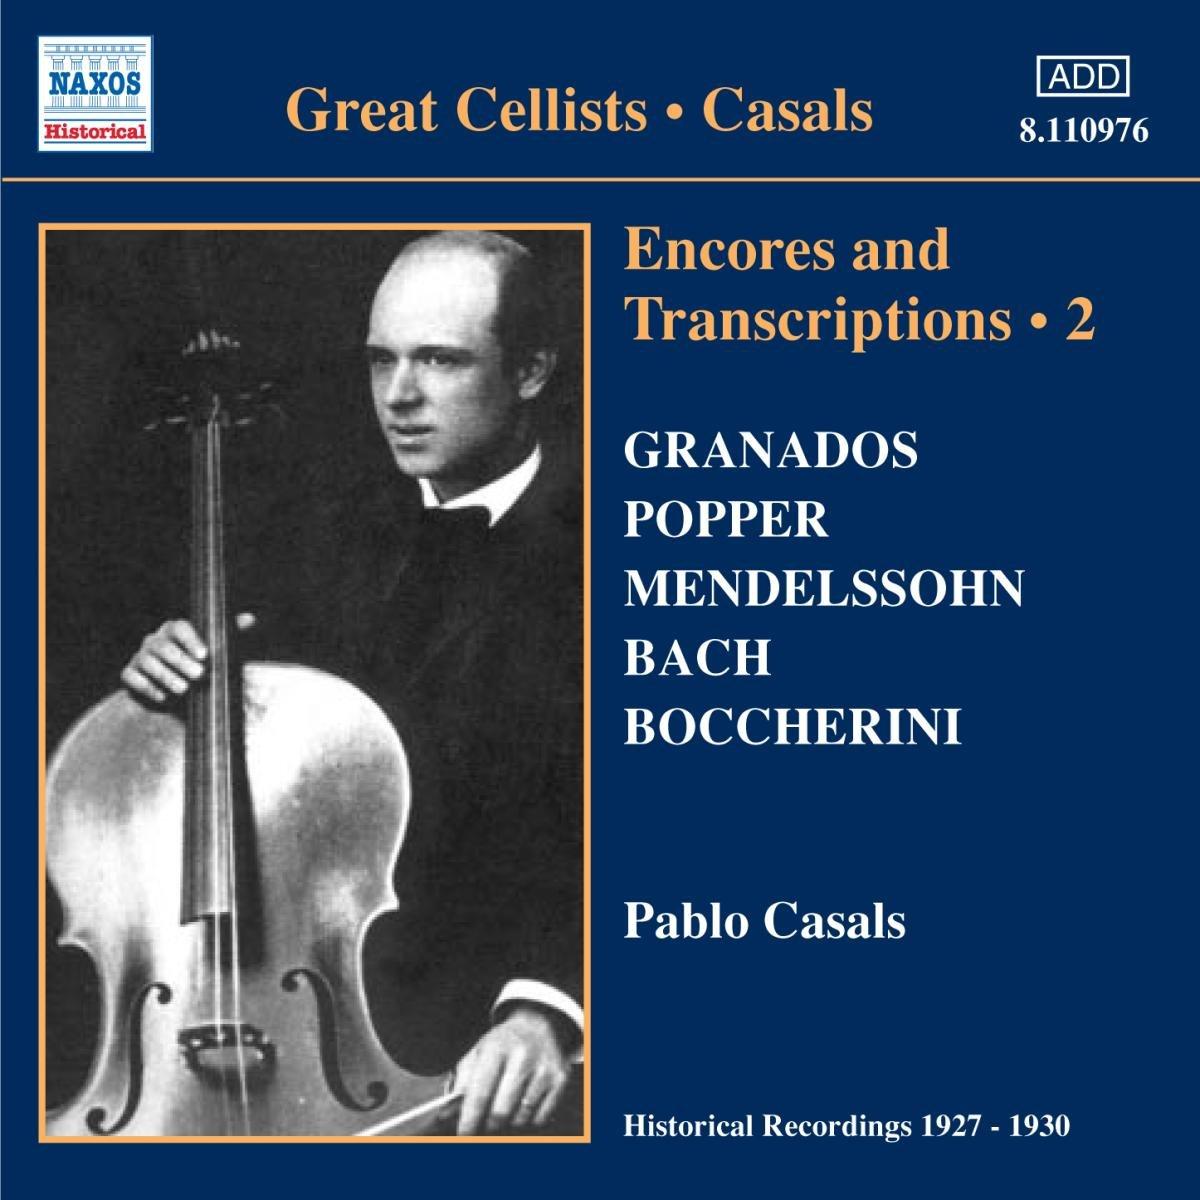 Casals, Pablo Encores and Transcriptions 2 Vinyl